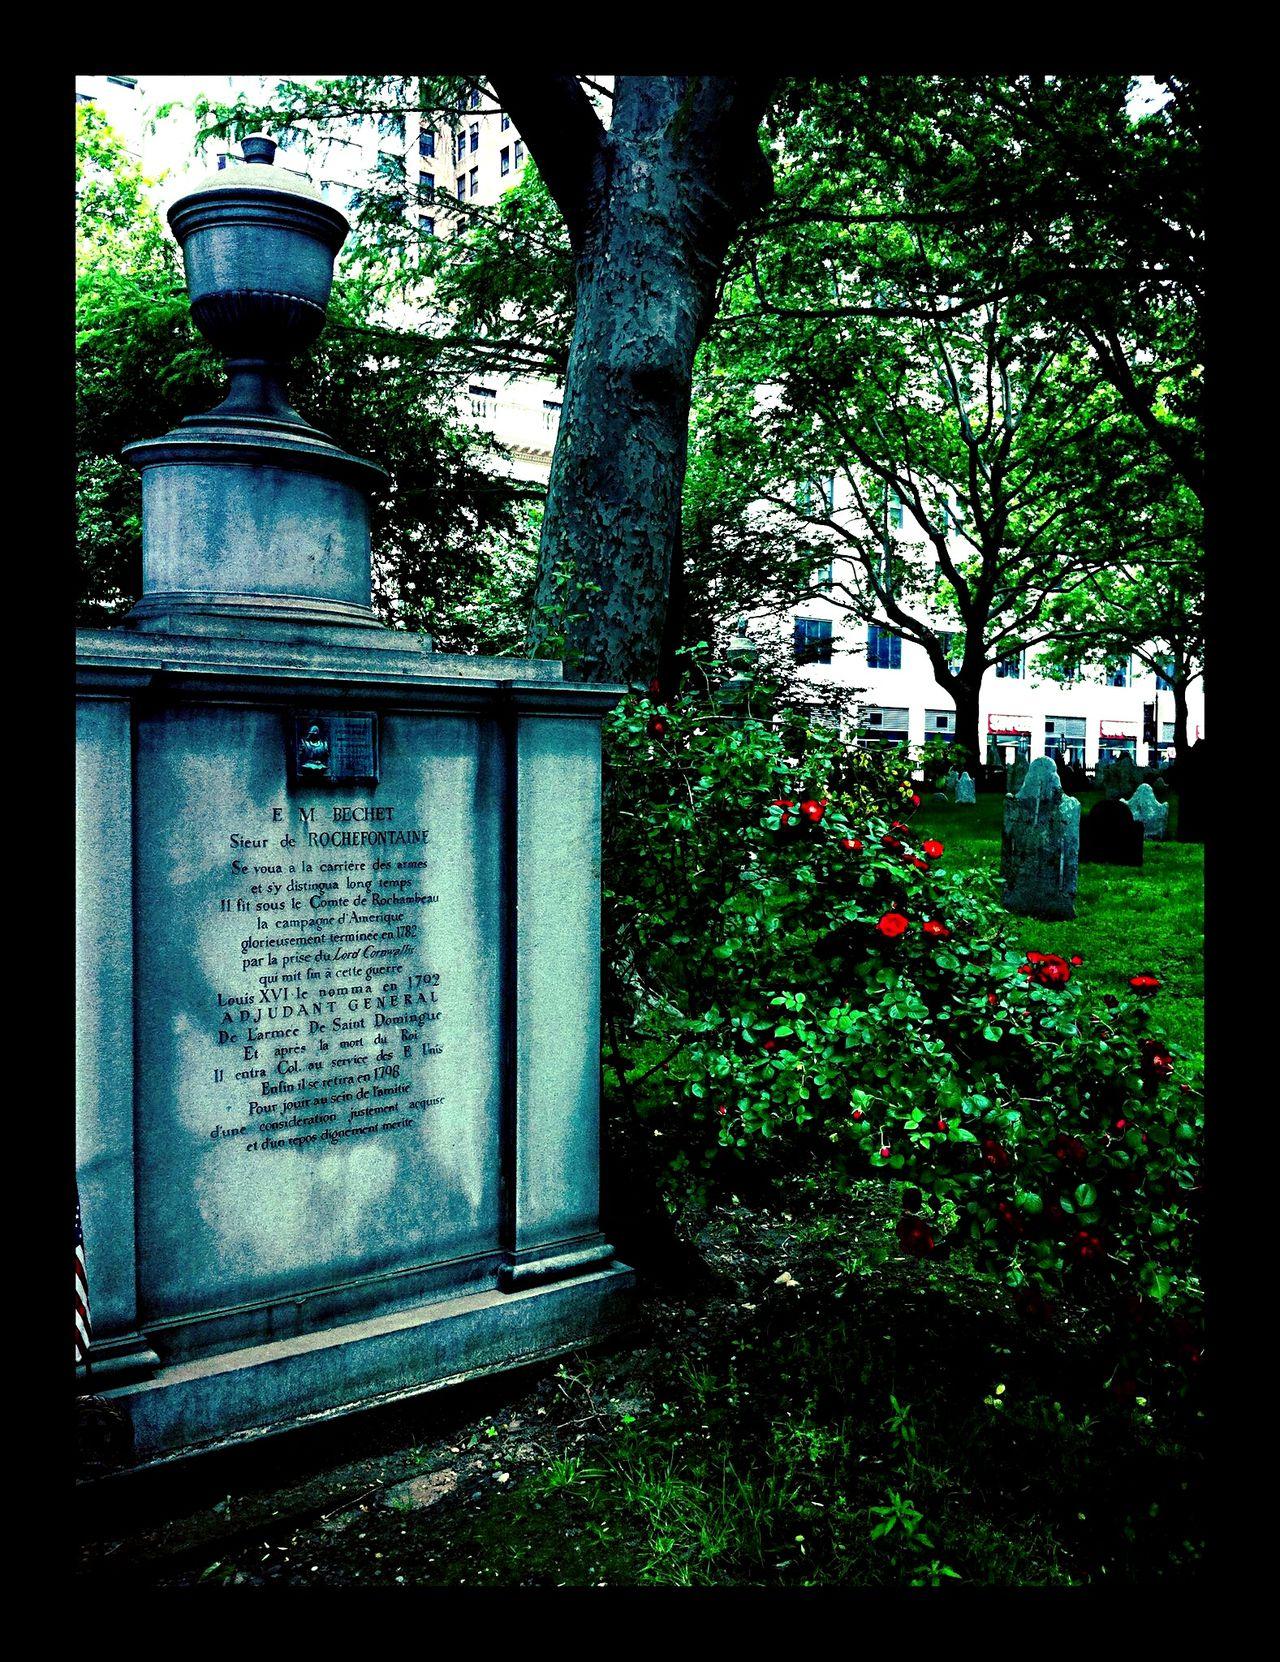 Color Photography Historical Building Church Graveyard Architecture EyeEm Best Shots Sculptures Flower Garden Life